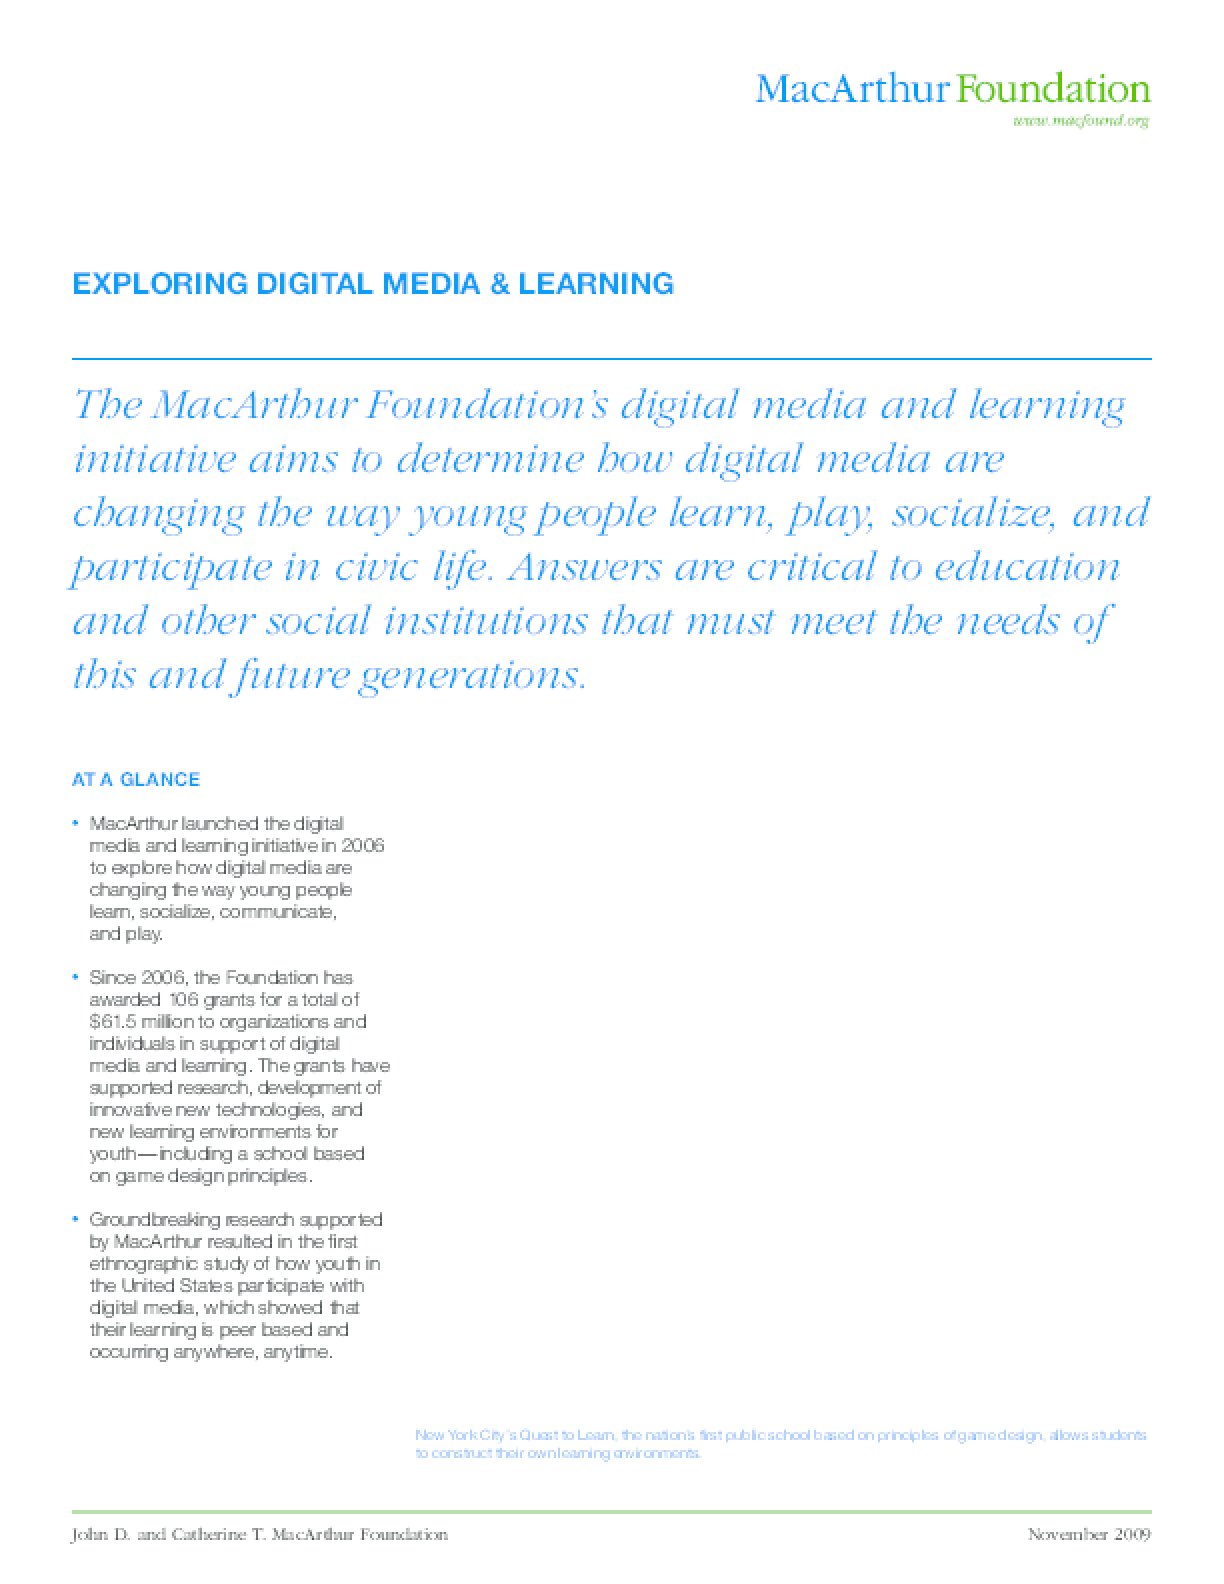 Exploring Digital Media & Learning